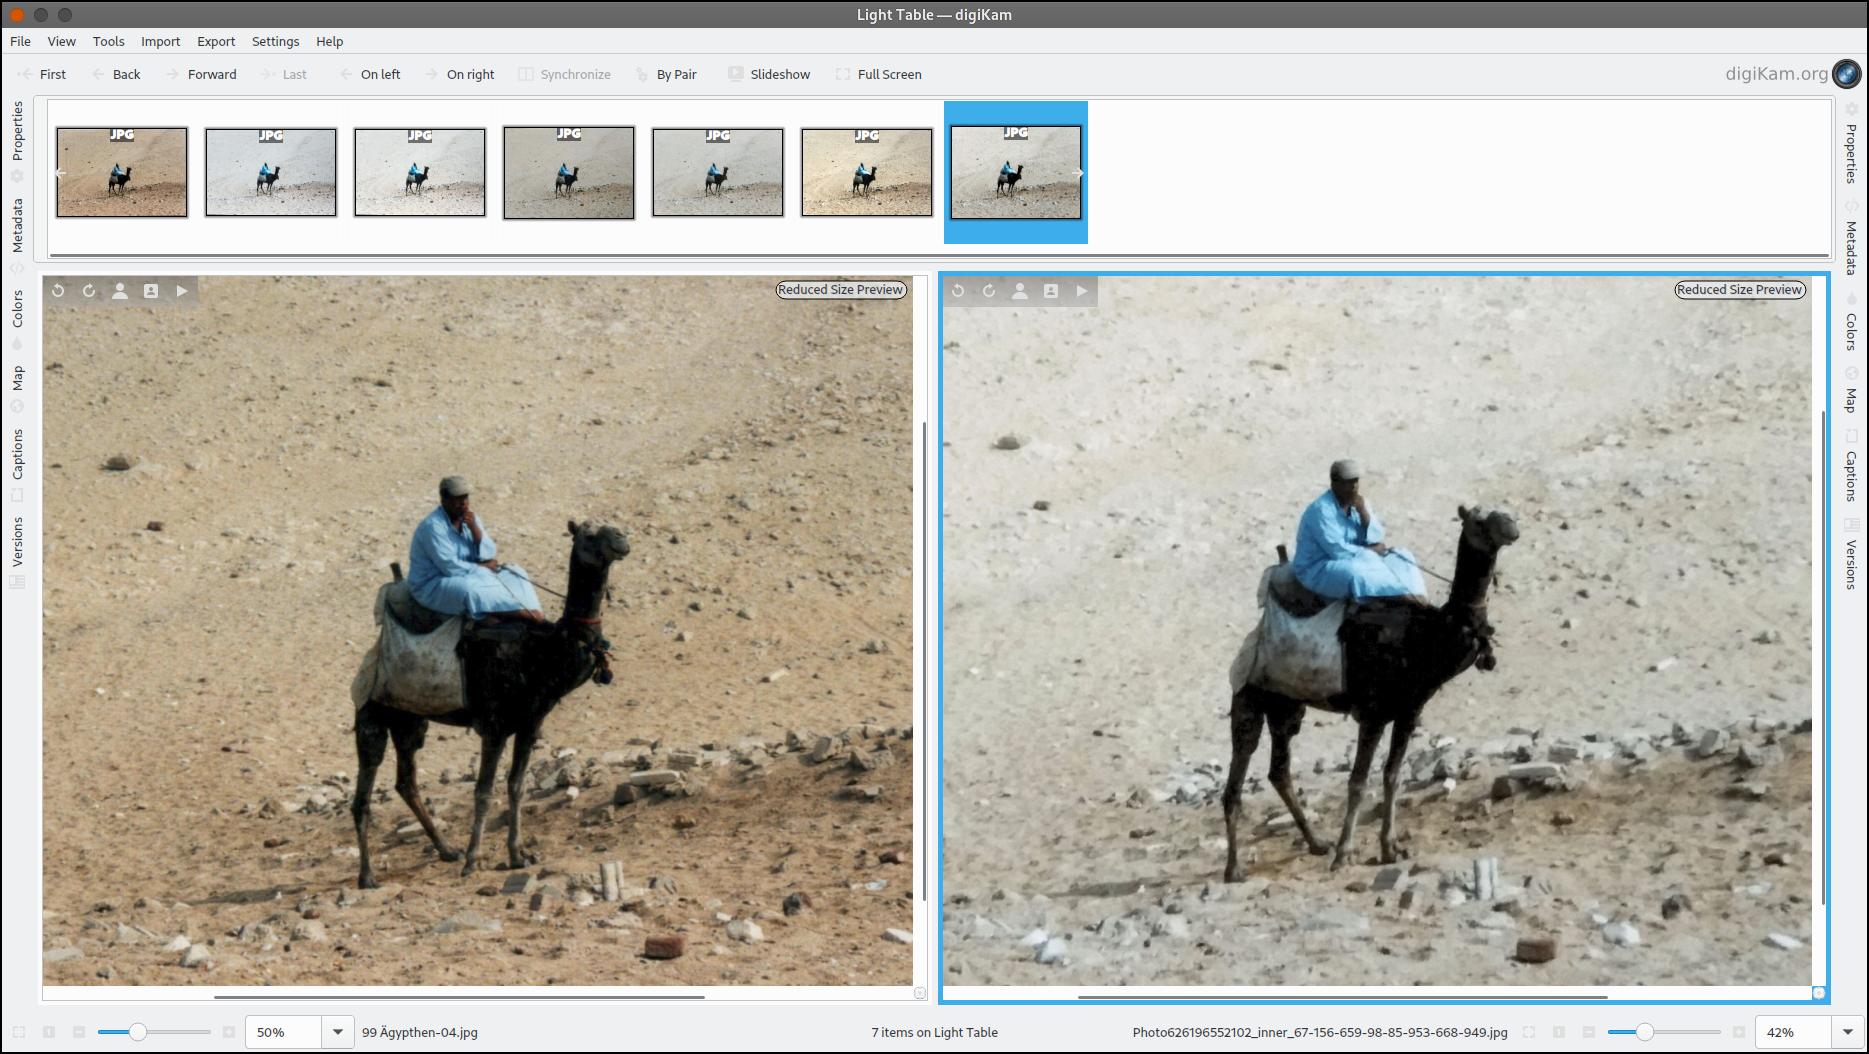 Dokumentenscanner vs Fotoscanner